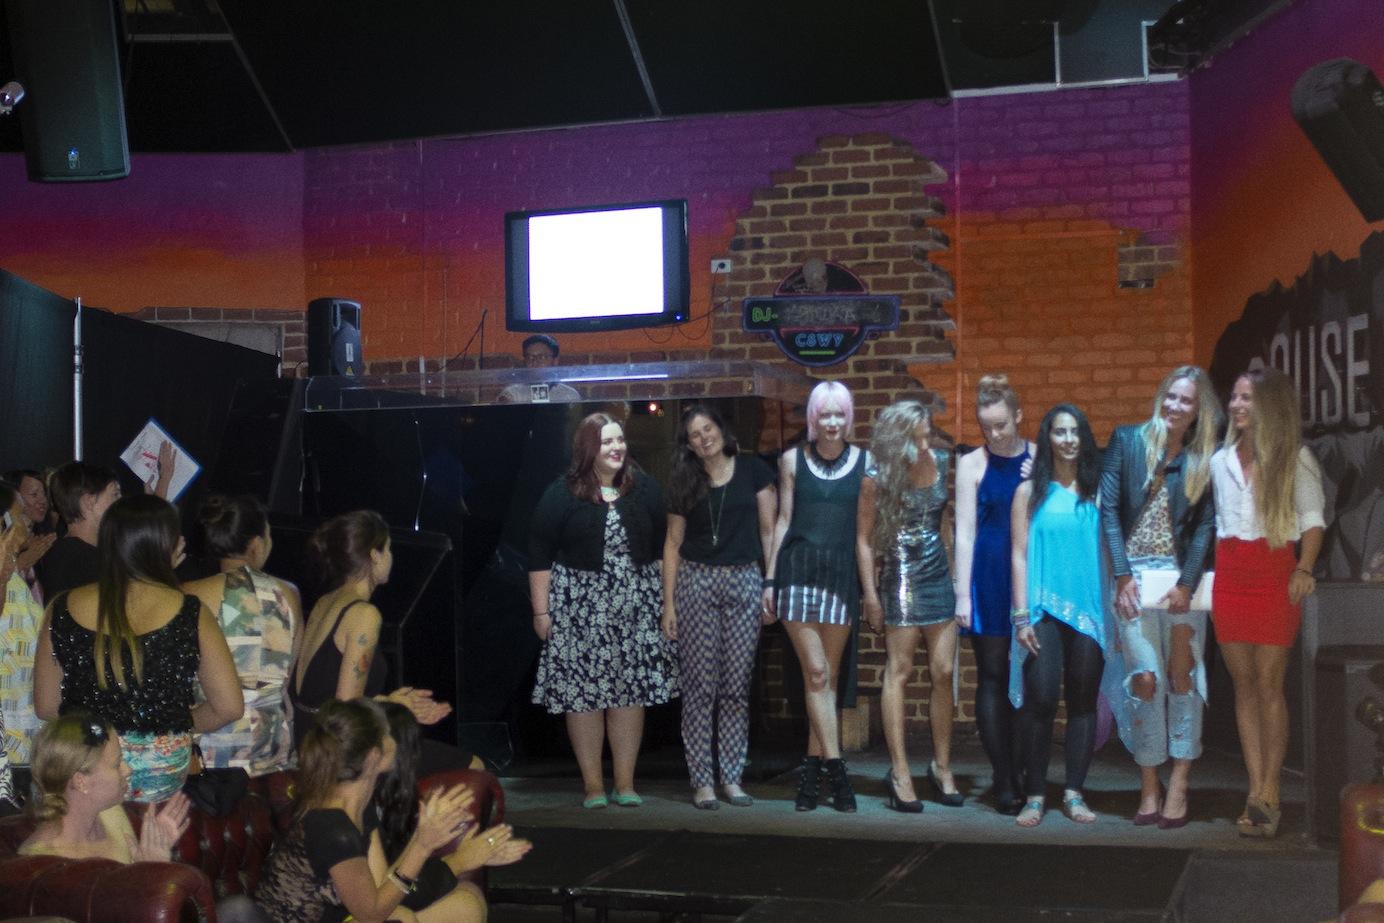 Fox Feet, Collosoul, Rabbit, Perth, Perth Designers, Perth Fashion, Australian Designers, WA fashion, dress, rabbit, cloud, cute, kawaii, jacket, Jessica Reeves, Blushed, The Causeway, Nezuki, Vanessa Collars, Perth Blogger, fashion blogger